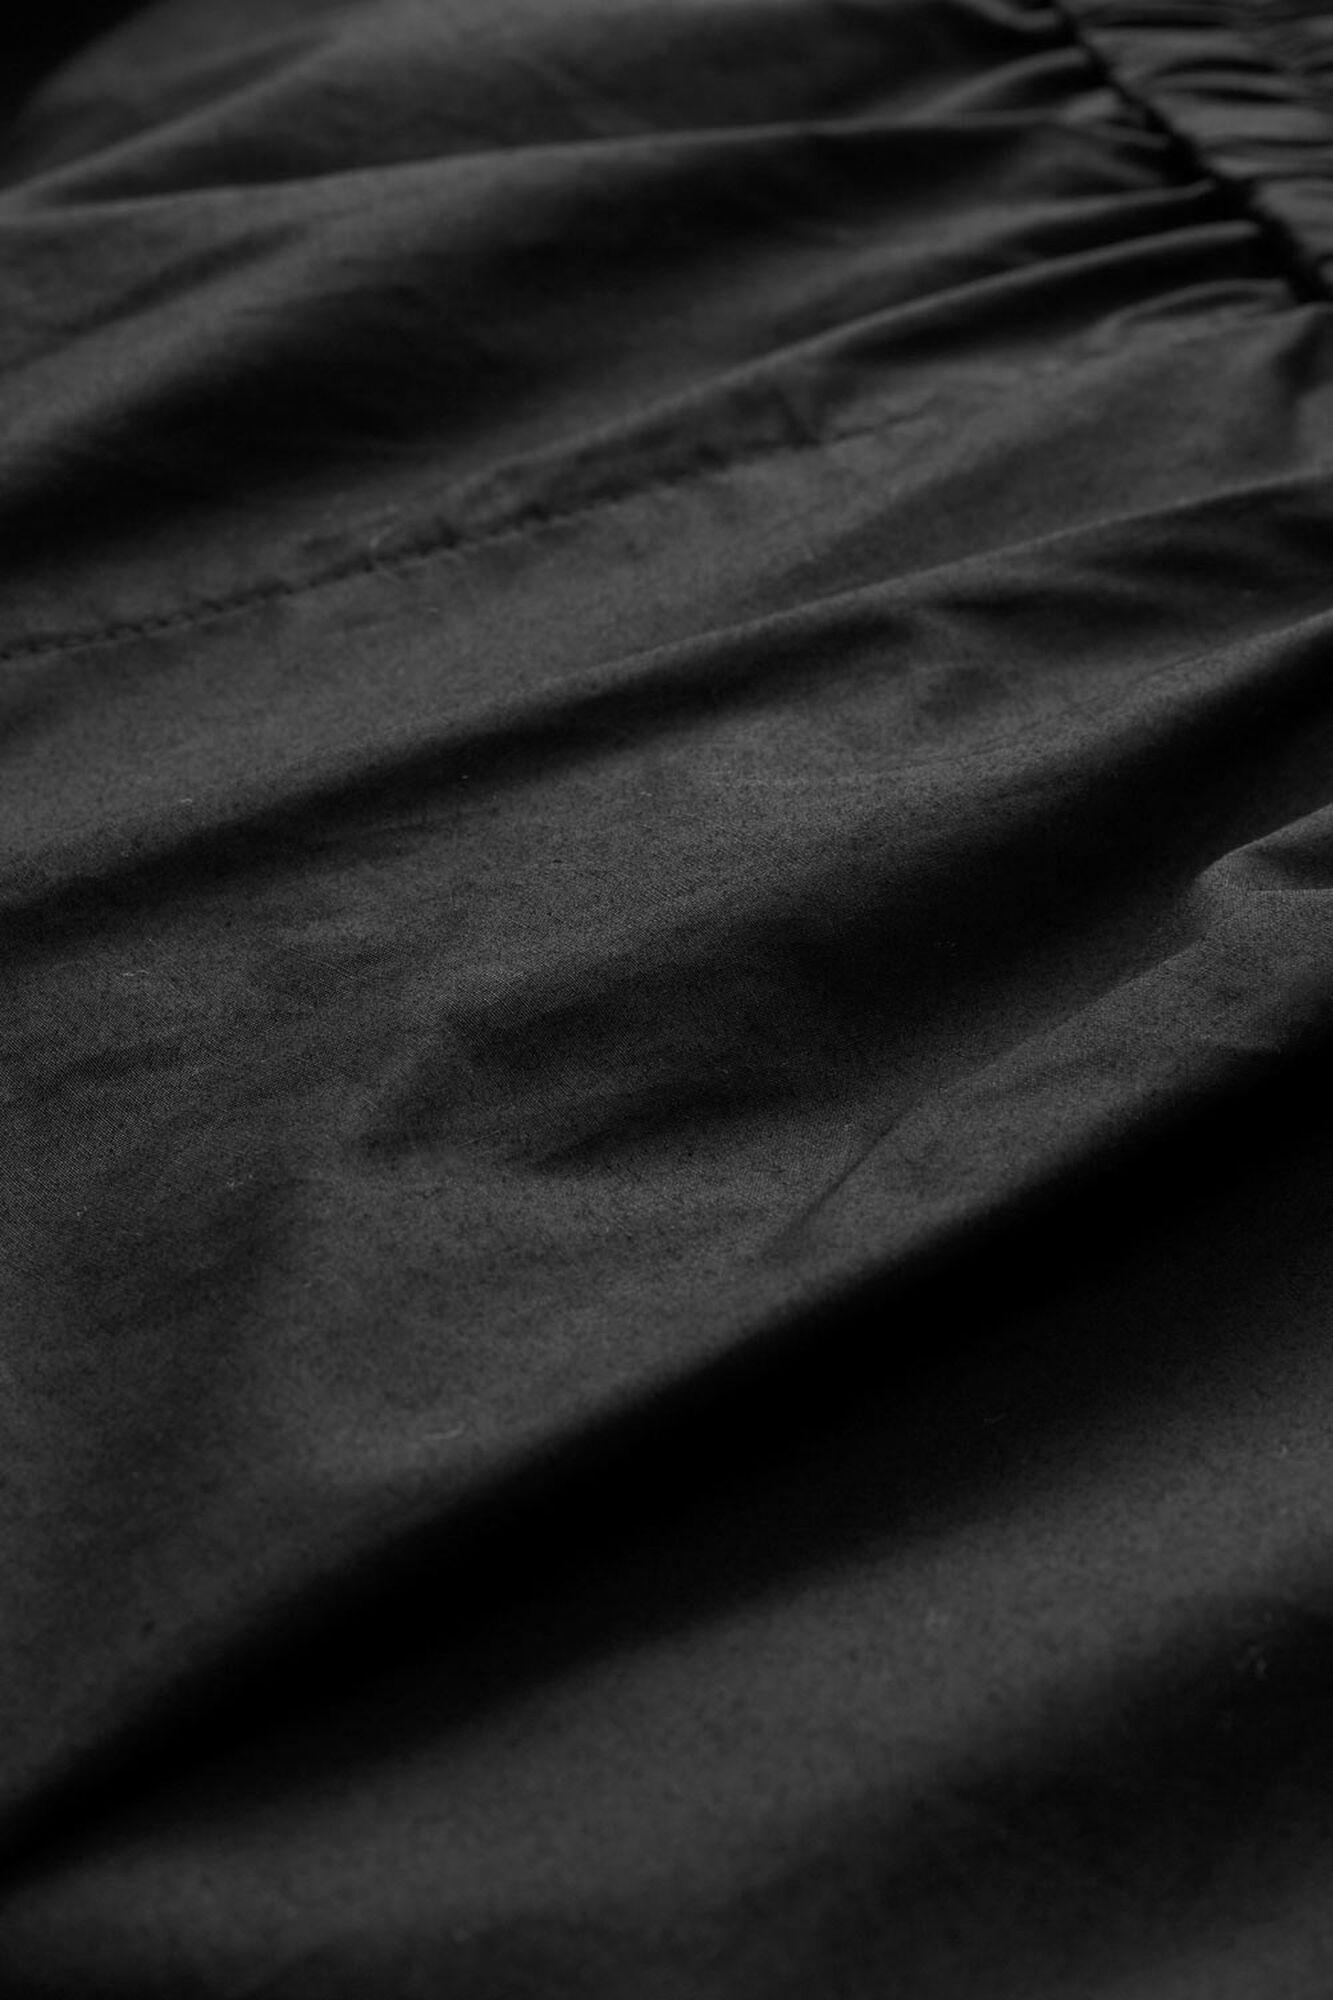 PARI TROUSERS, Black, hi-res